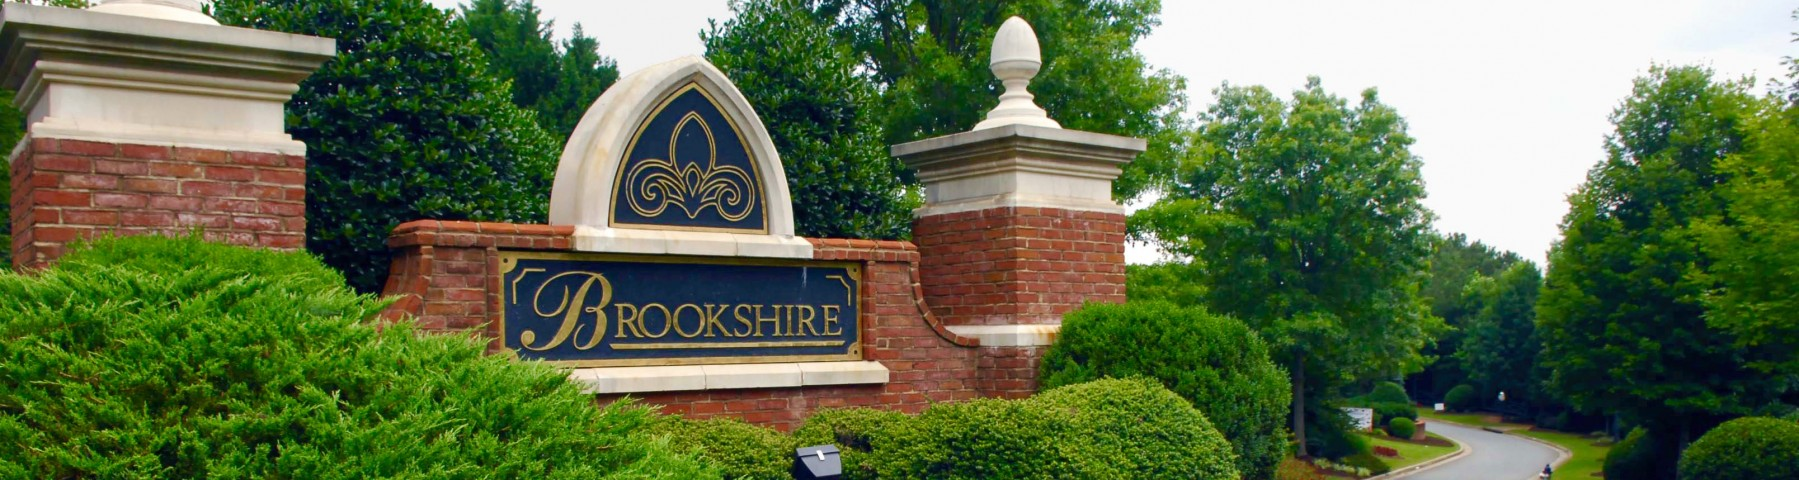 The Brookshire Subdivision